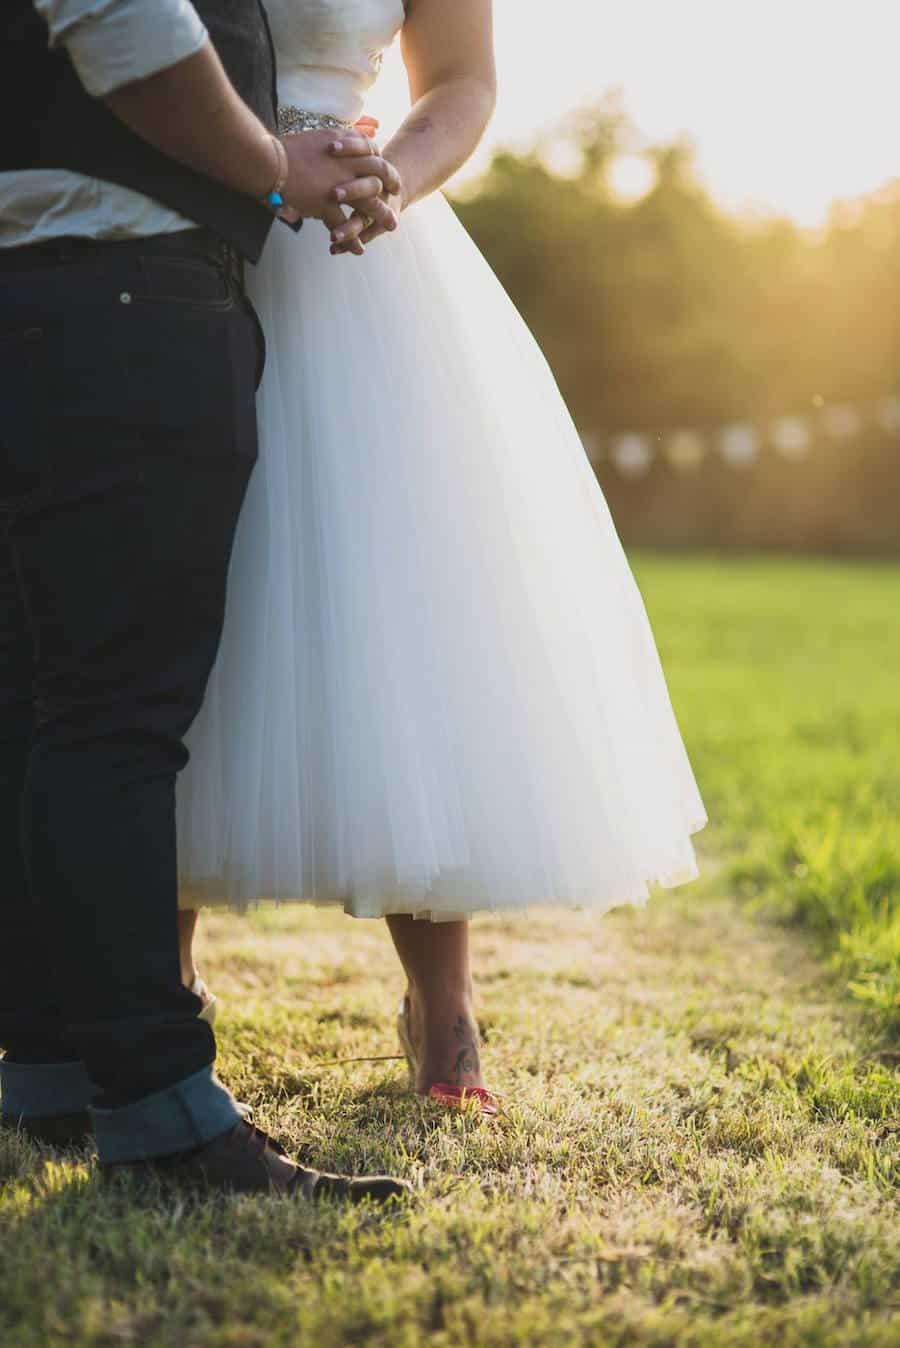 married - Sami Tipi Wedding at Bawdon Lodge Farm